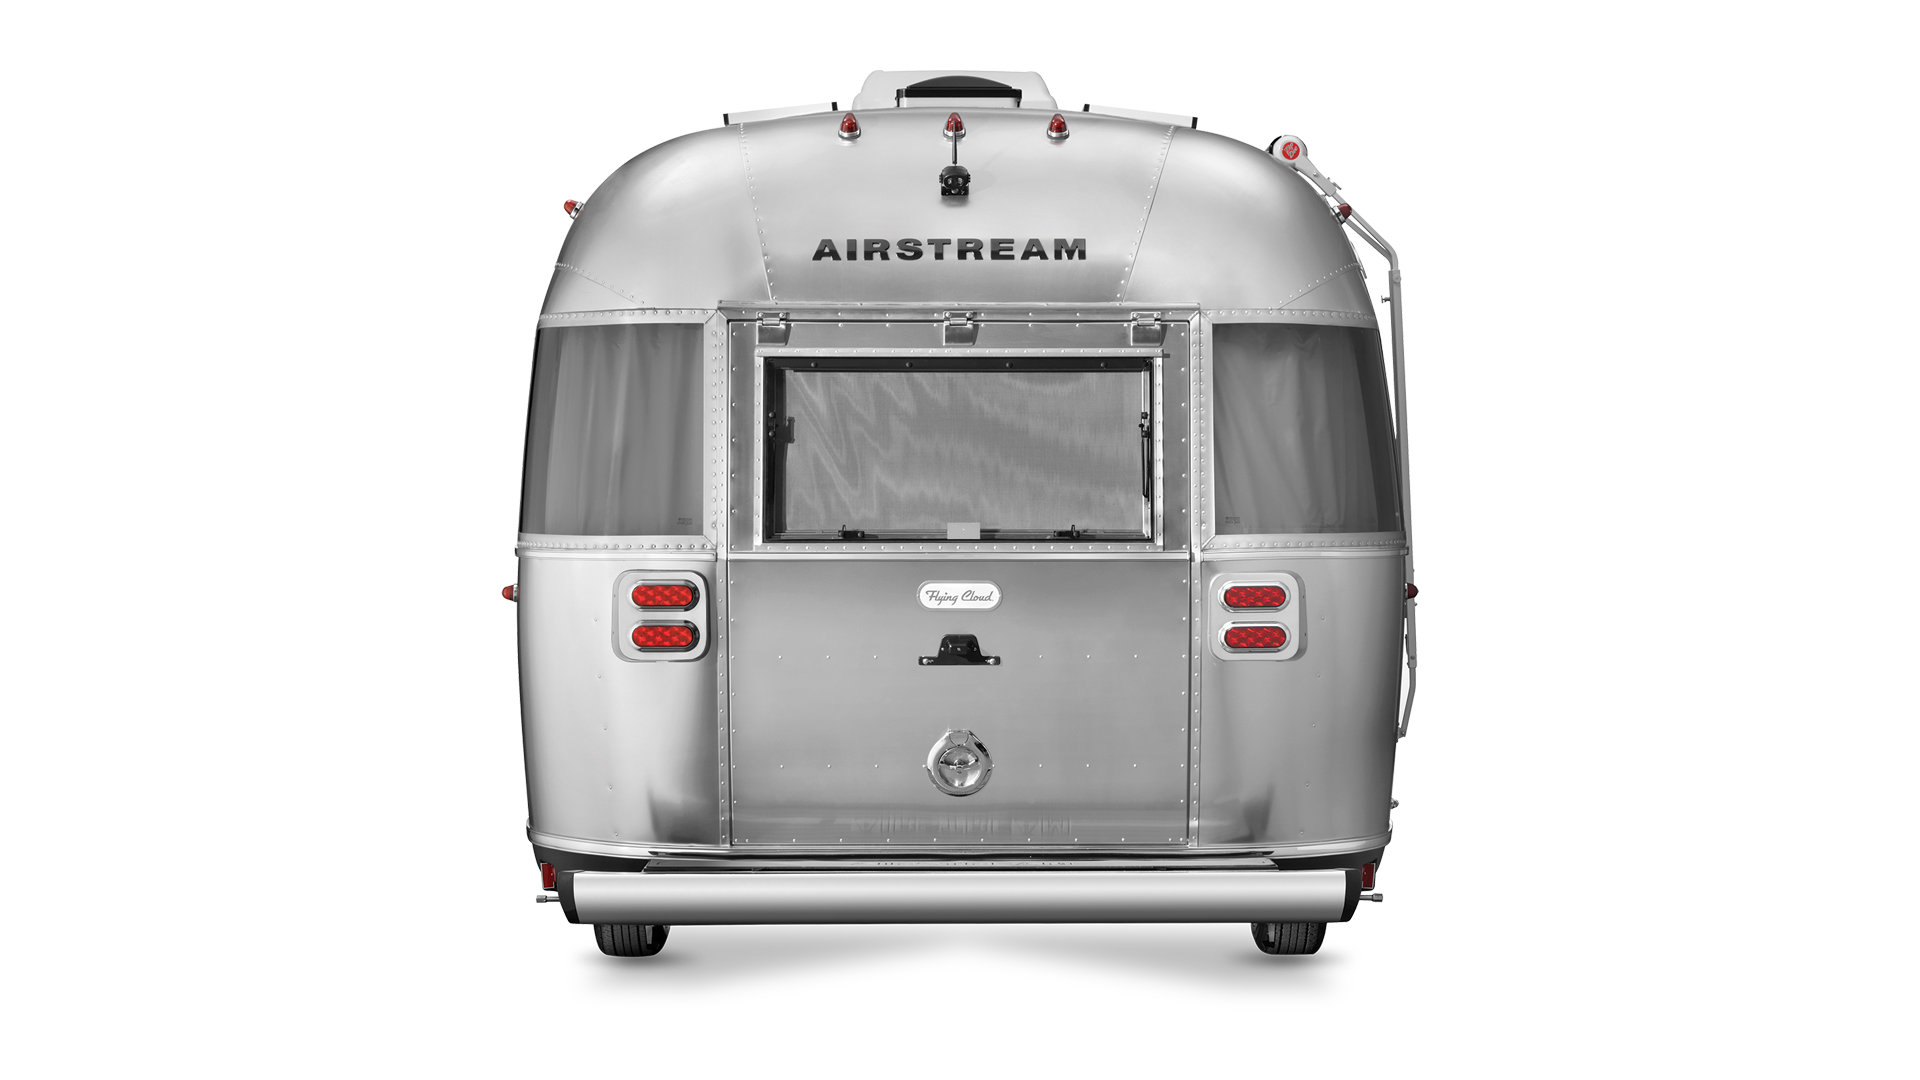 Airstream Travel Trailer Flying Cloud 25FB Twin Floorplan Rear view